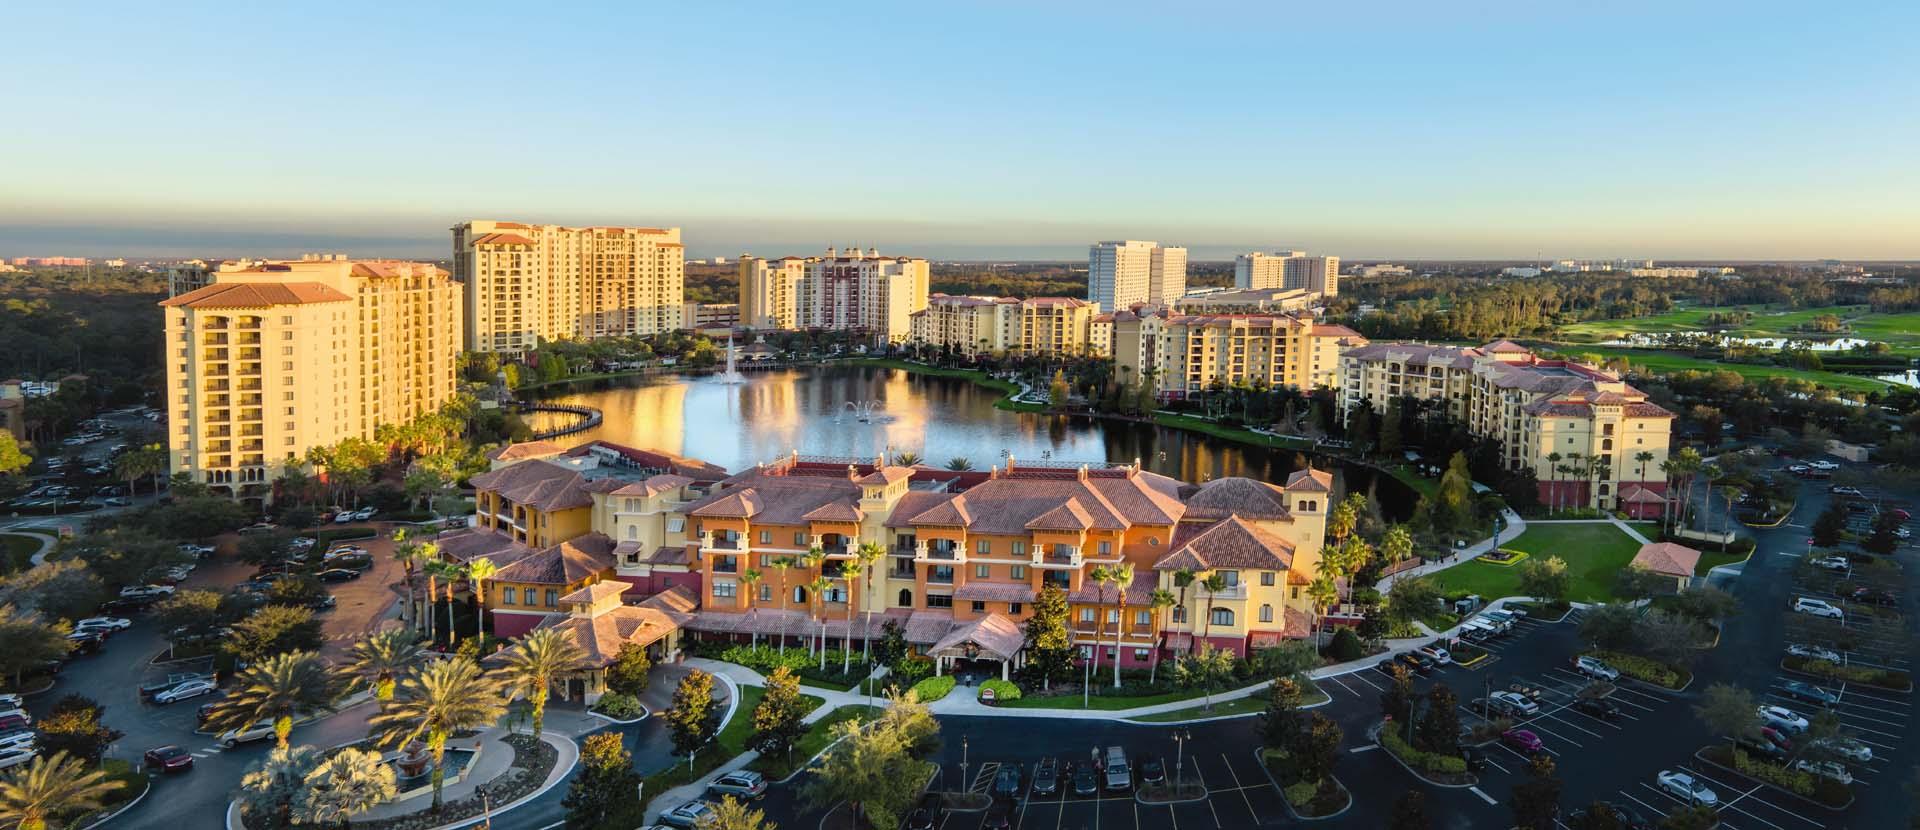 Orlando Resorts Near Disney Wyndham Bonnet Creek Resort